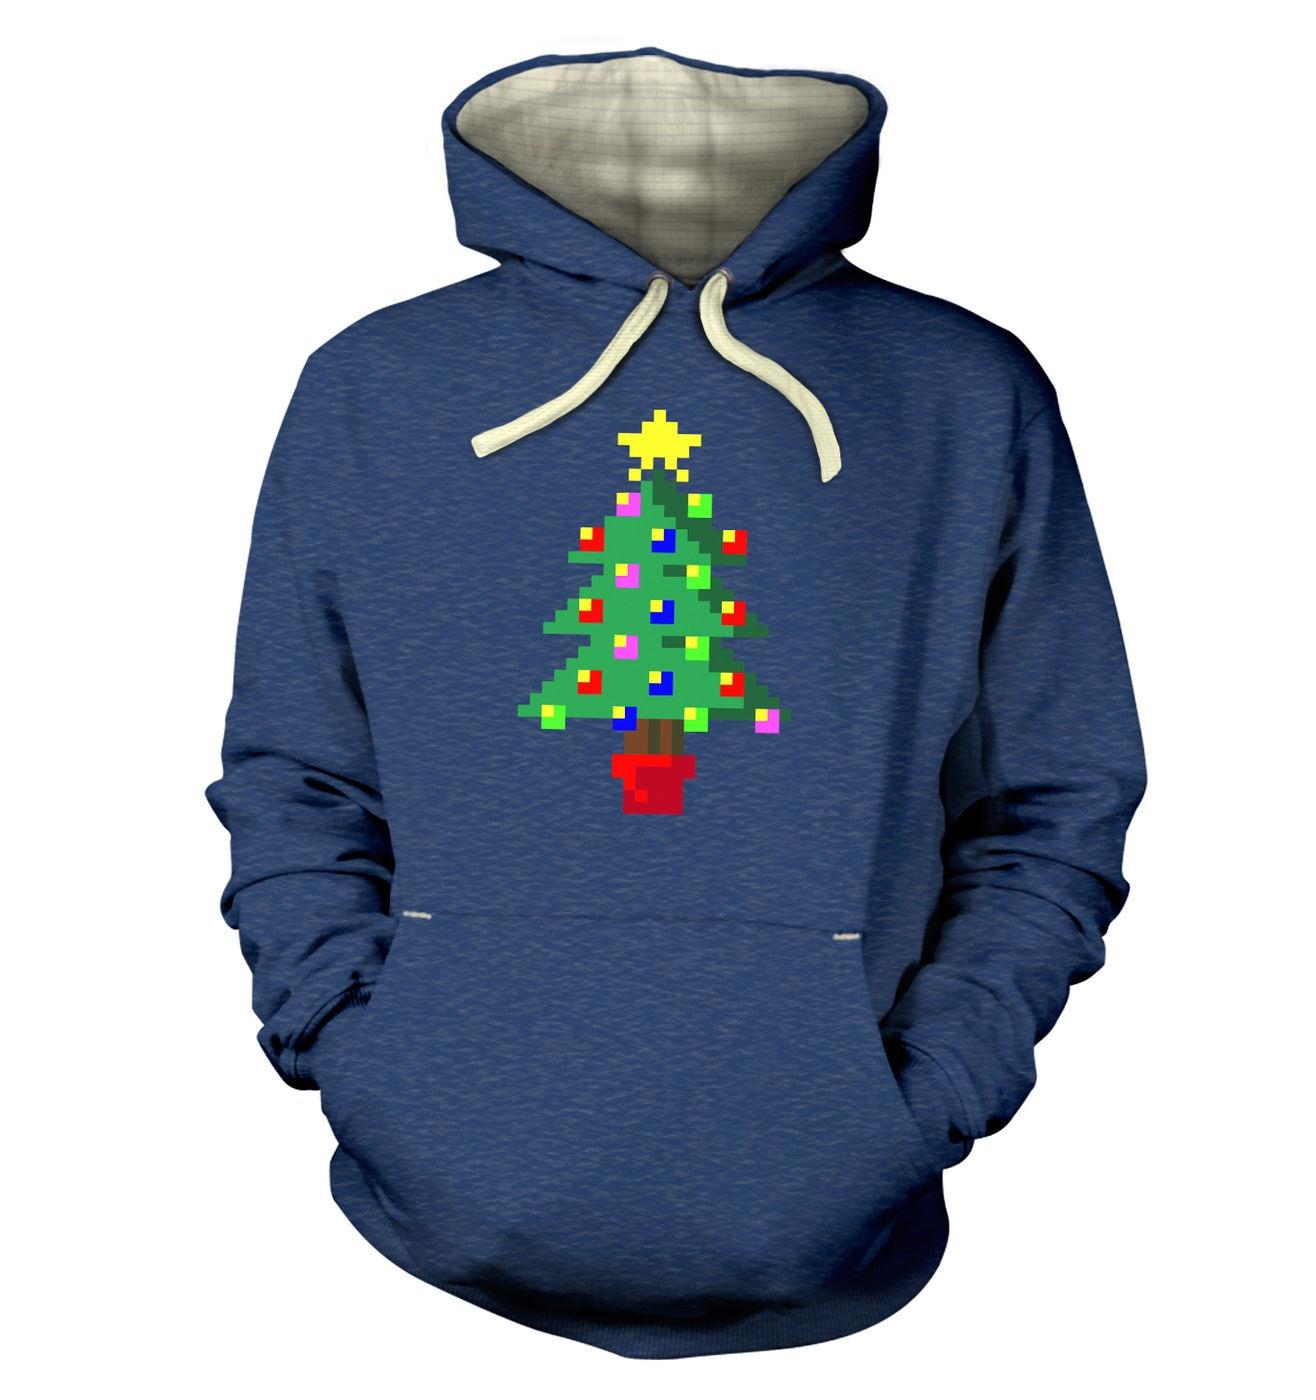 Pixellated Christmas Tree hoodie (premium) - super-warm stylish hoody